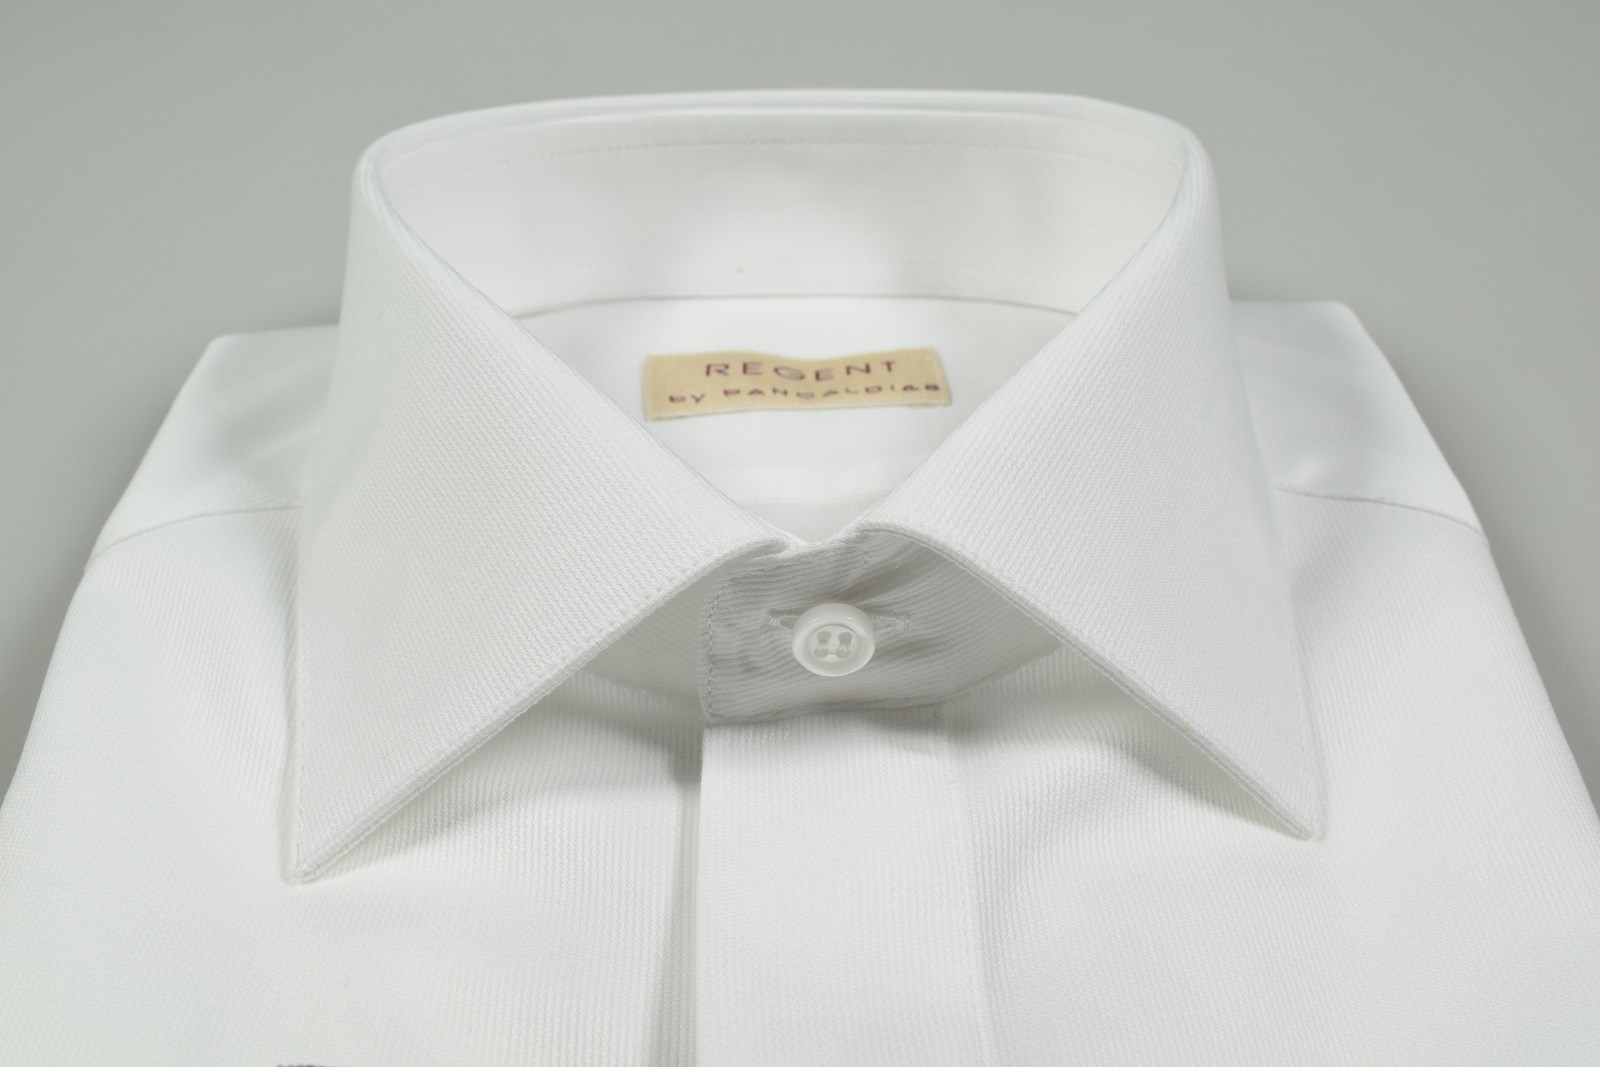 uk availability b8034 2b9af Camicia uomo elegante polso doppio da gemelli bianca slim fit